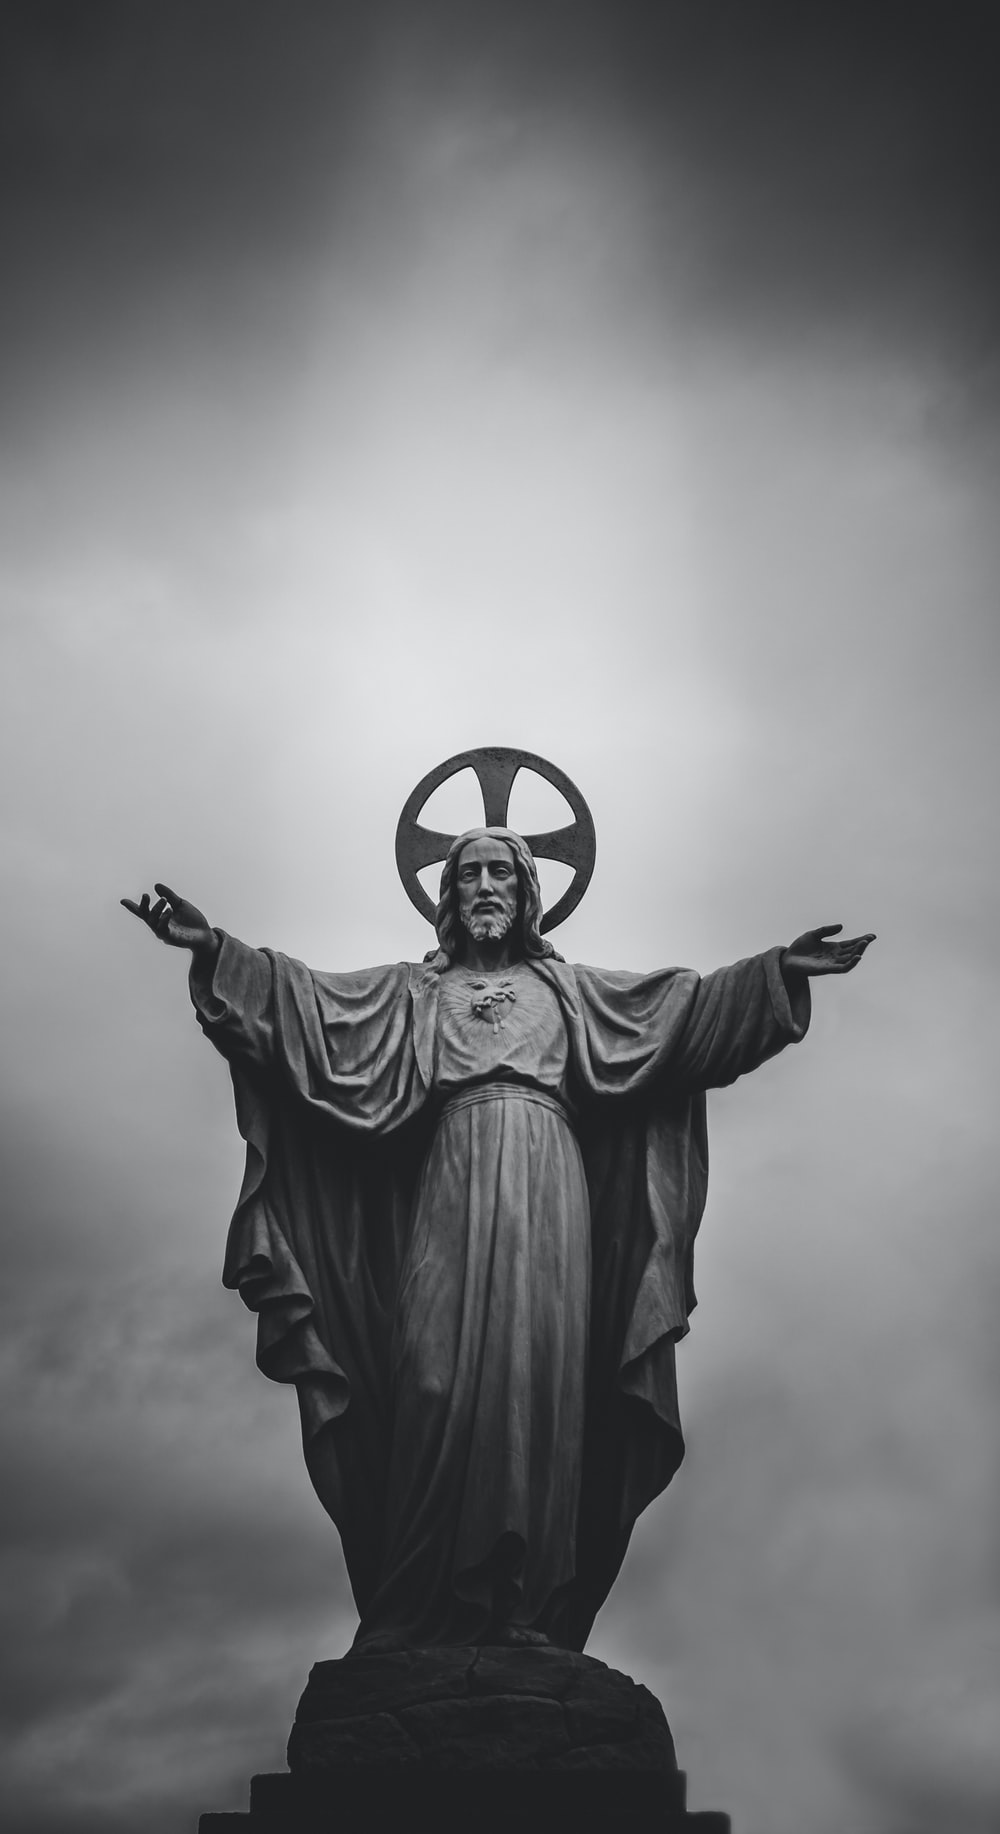 grayscale photograph of Jesus Christ statue